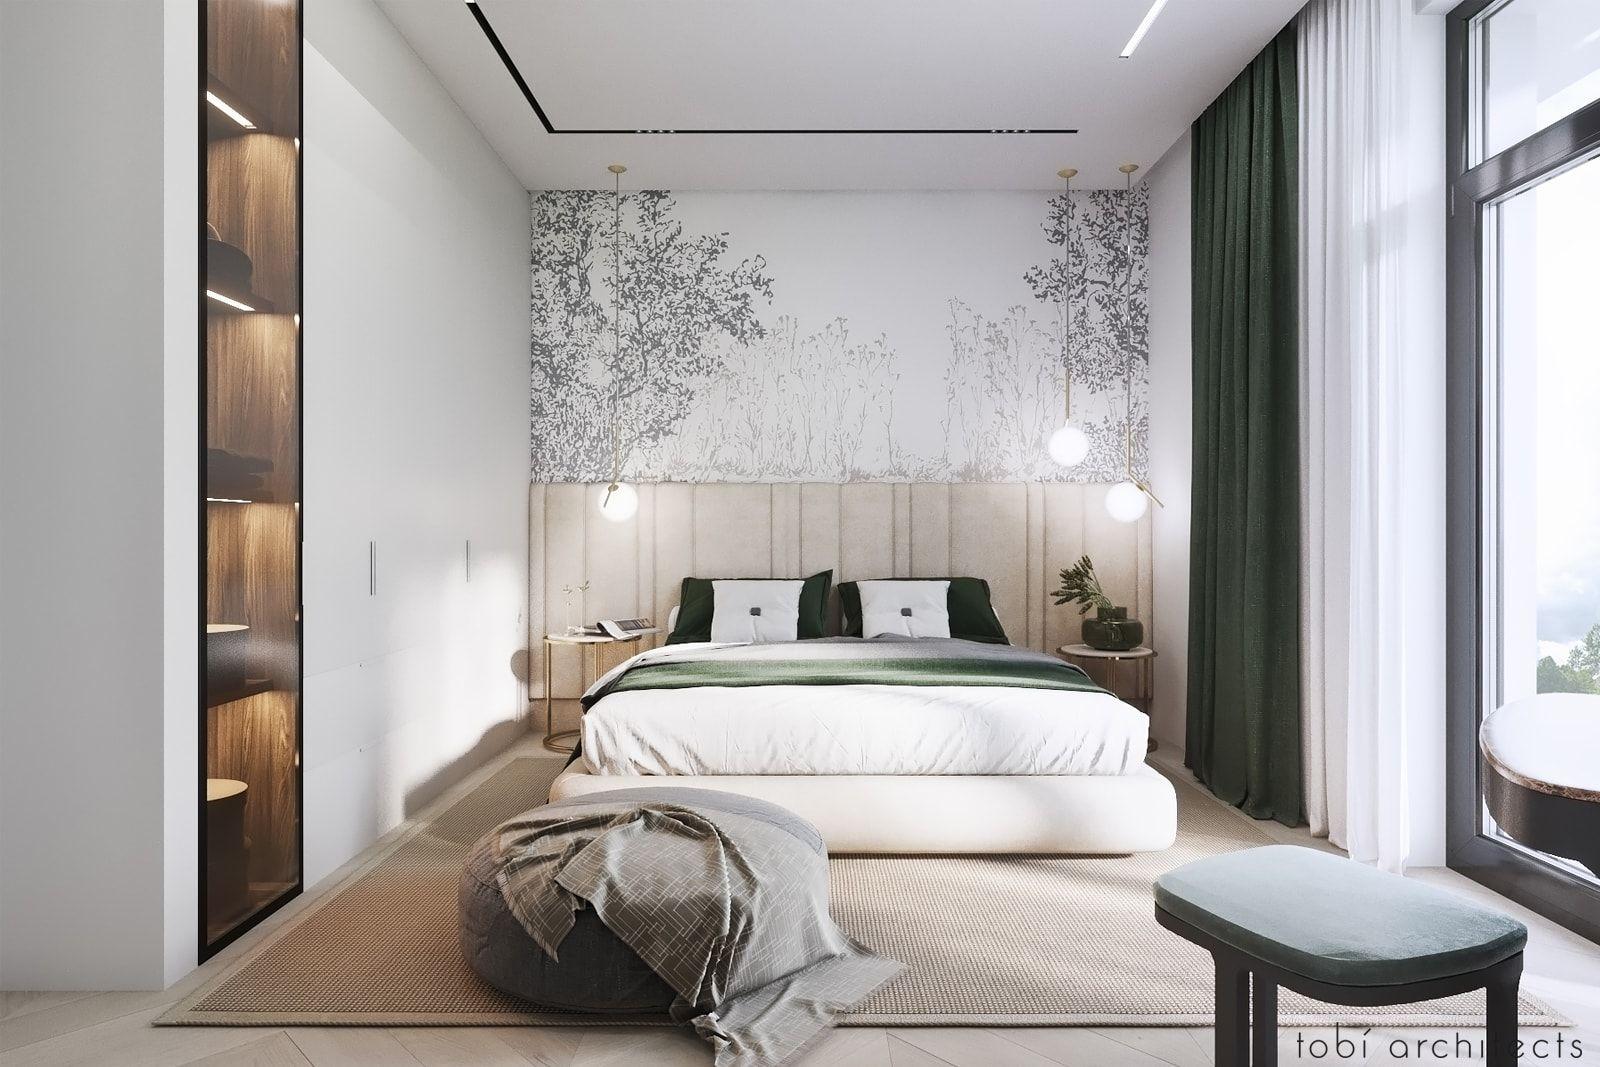 12 Genius Designs Of How To Build Bedroom Designs Modern Interior Design Ideas Photos In 2021 Bedroom Design Modern House Interior Design Modern house bedroom design